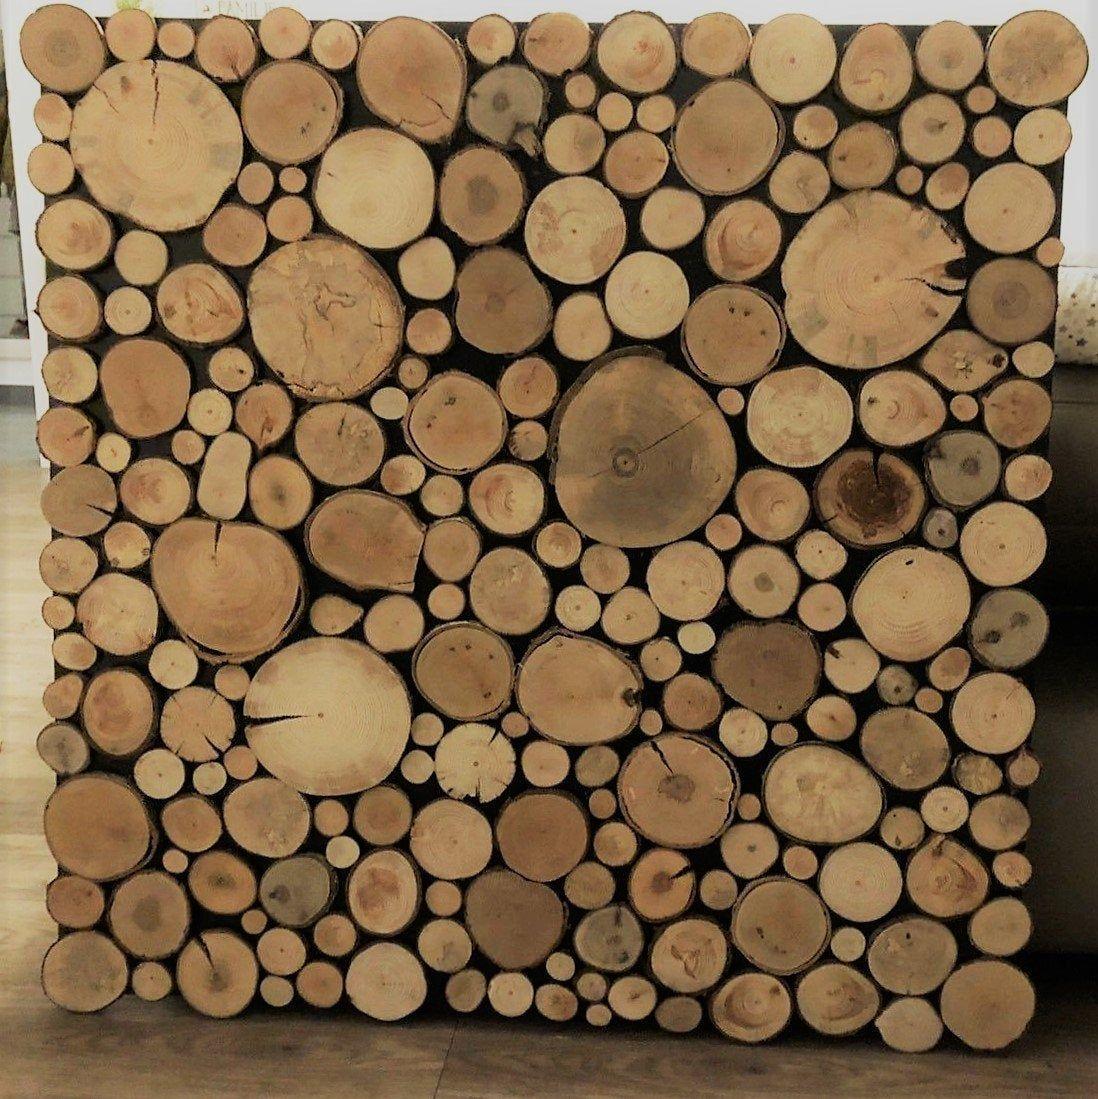 100 Wooden Discs Astscheiben Deco Wood Holzscheibendeko 100 Holzscheiben Astscheiben Deko Holz Etsy Deko Holz Holzscheiben Astscheiben